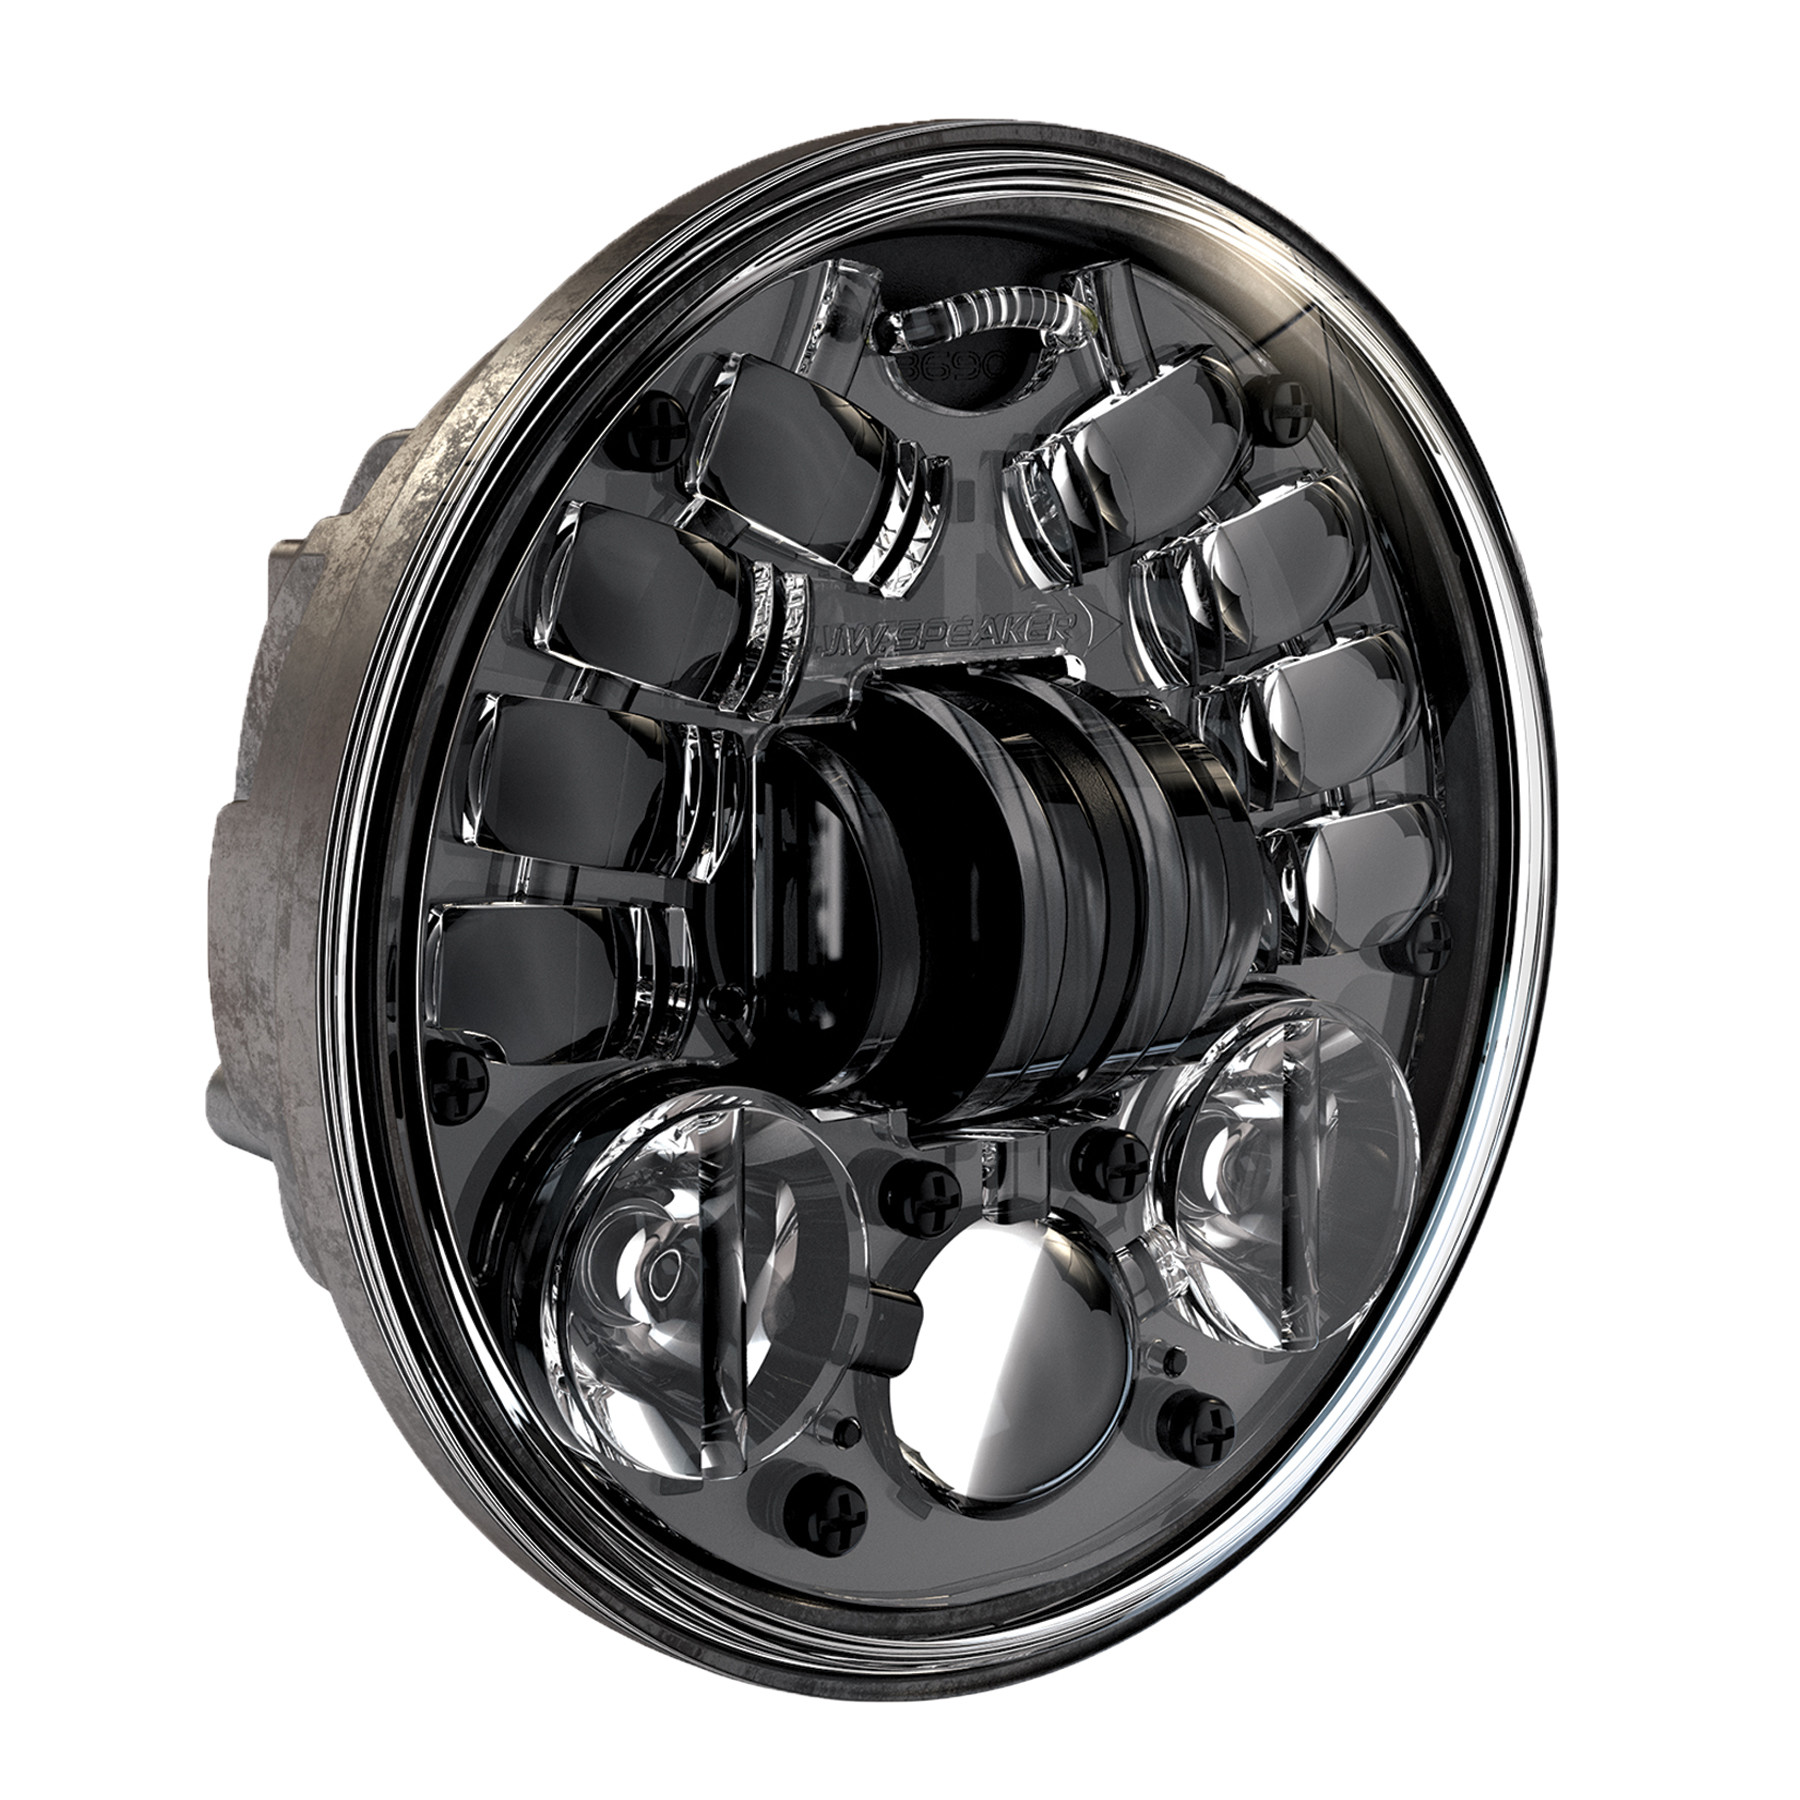 "ADAPTIVE HEADLIGHT 5.75"" BLACK J.W. Speaker Corporation"